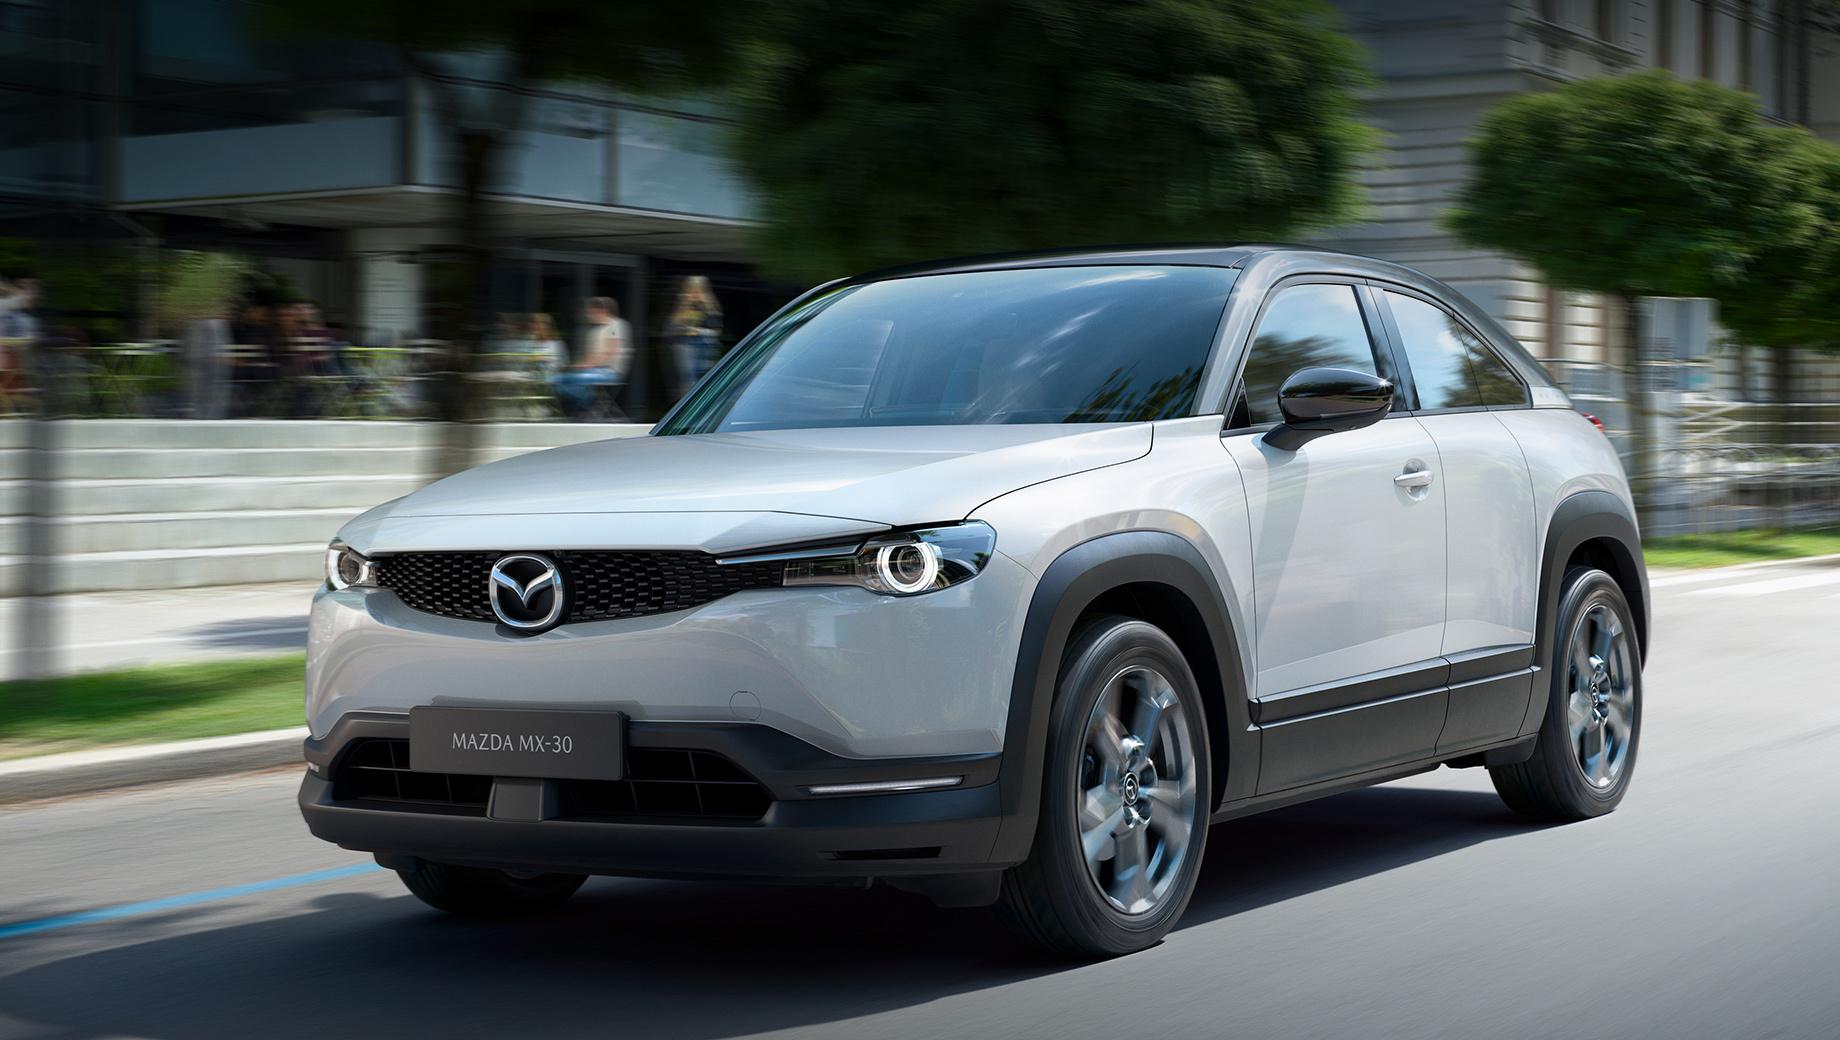 Mazda mx-30. По размерам новобранец ожидаемо повторяет Мазду CX-30 (из неё был сделан прототип e-TPV): длина, ширина, высота — 4395×1795×1570 мм, колёсная база — 2655. Правда, из-за батареи в днище электрокар выше на 30 мм. Размерность шин — 215/55 R18.